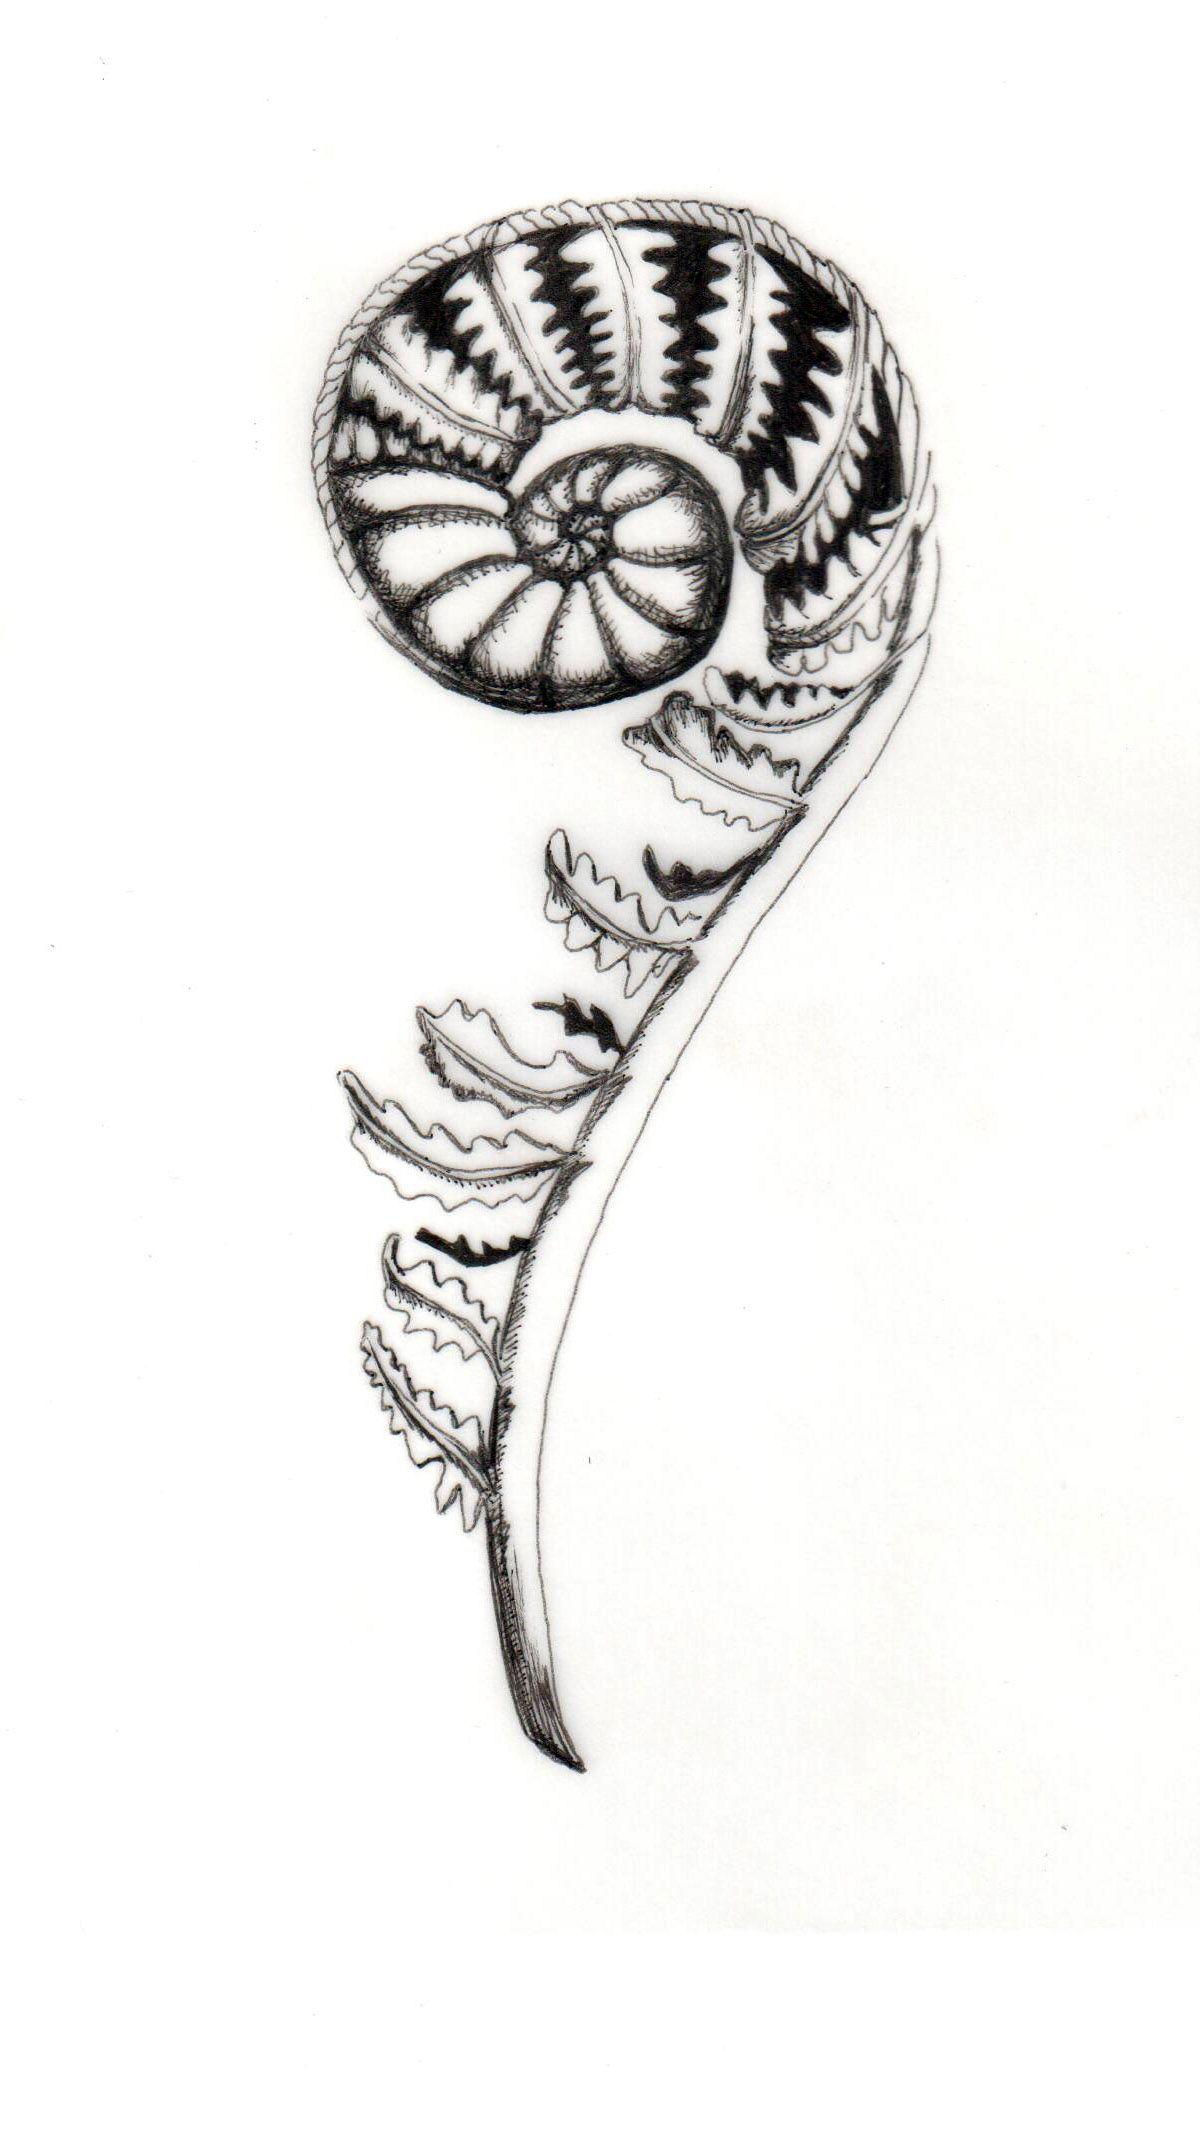 Fiddlehead Fern Illustration For Solstice By Kelsey Mosley